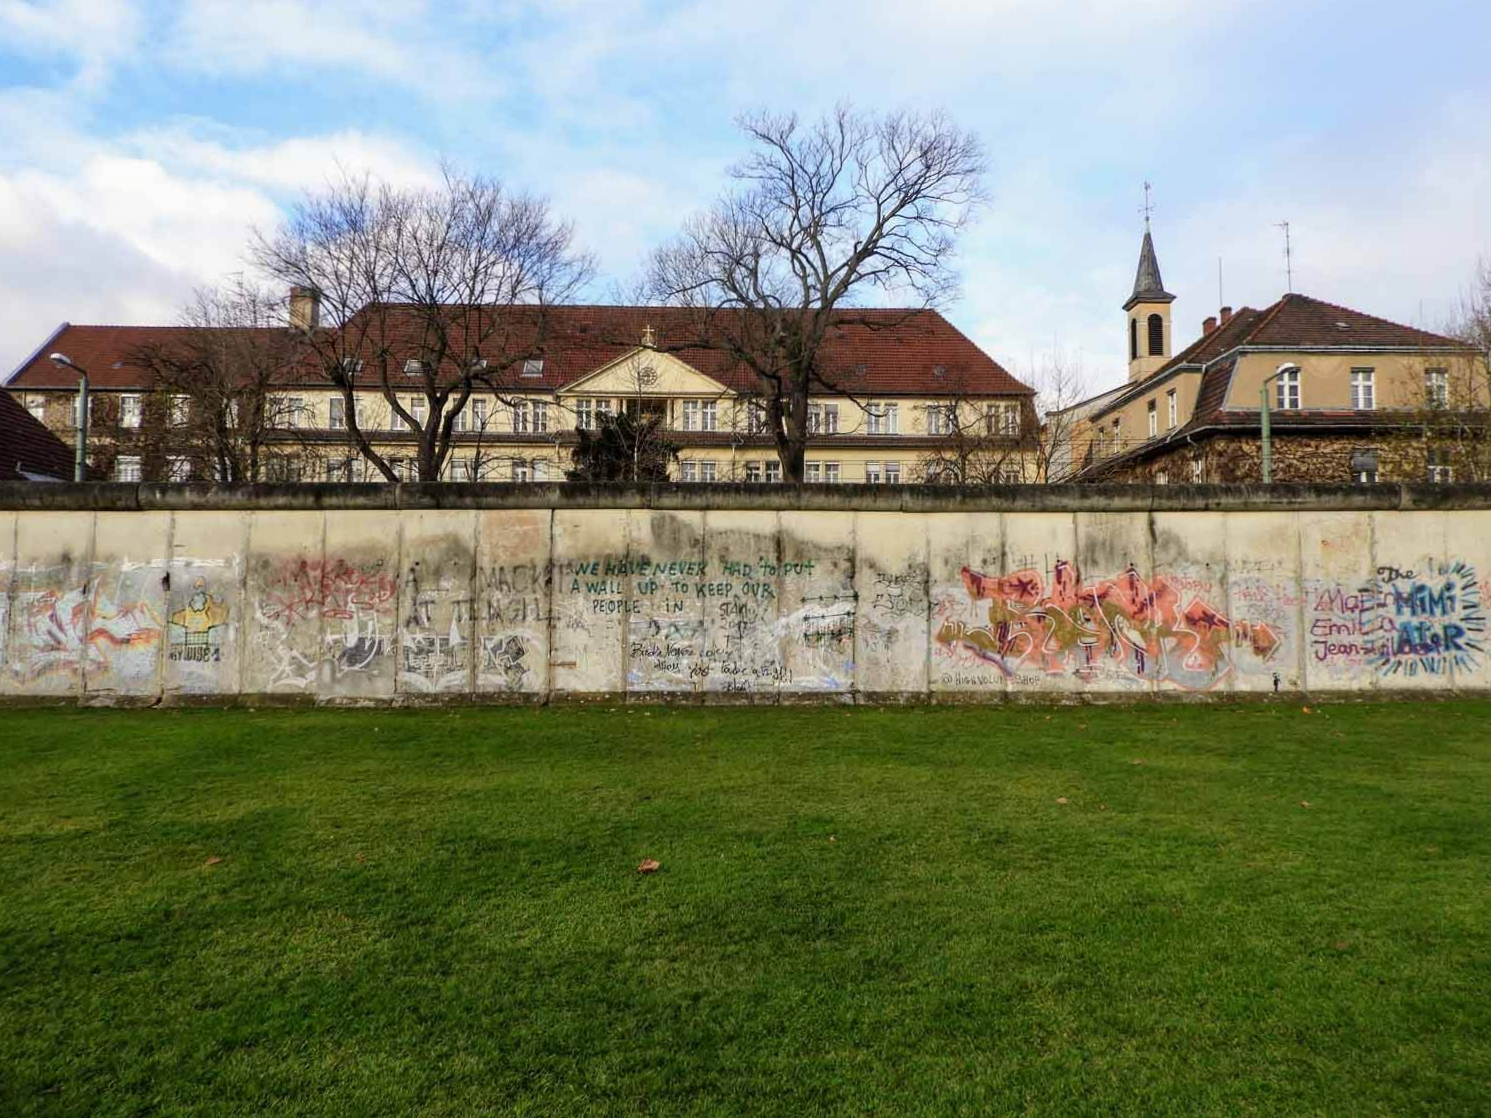 germany-berlin-wall-cold-war-soviet-union-west-vs-east-grafitti.jpg